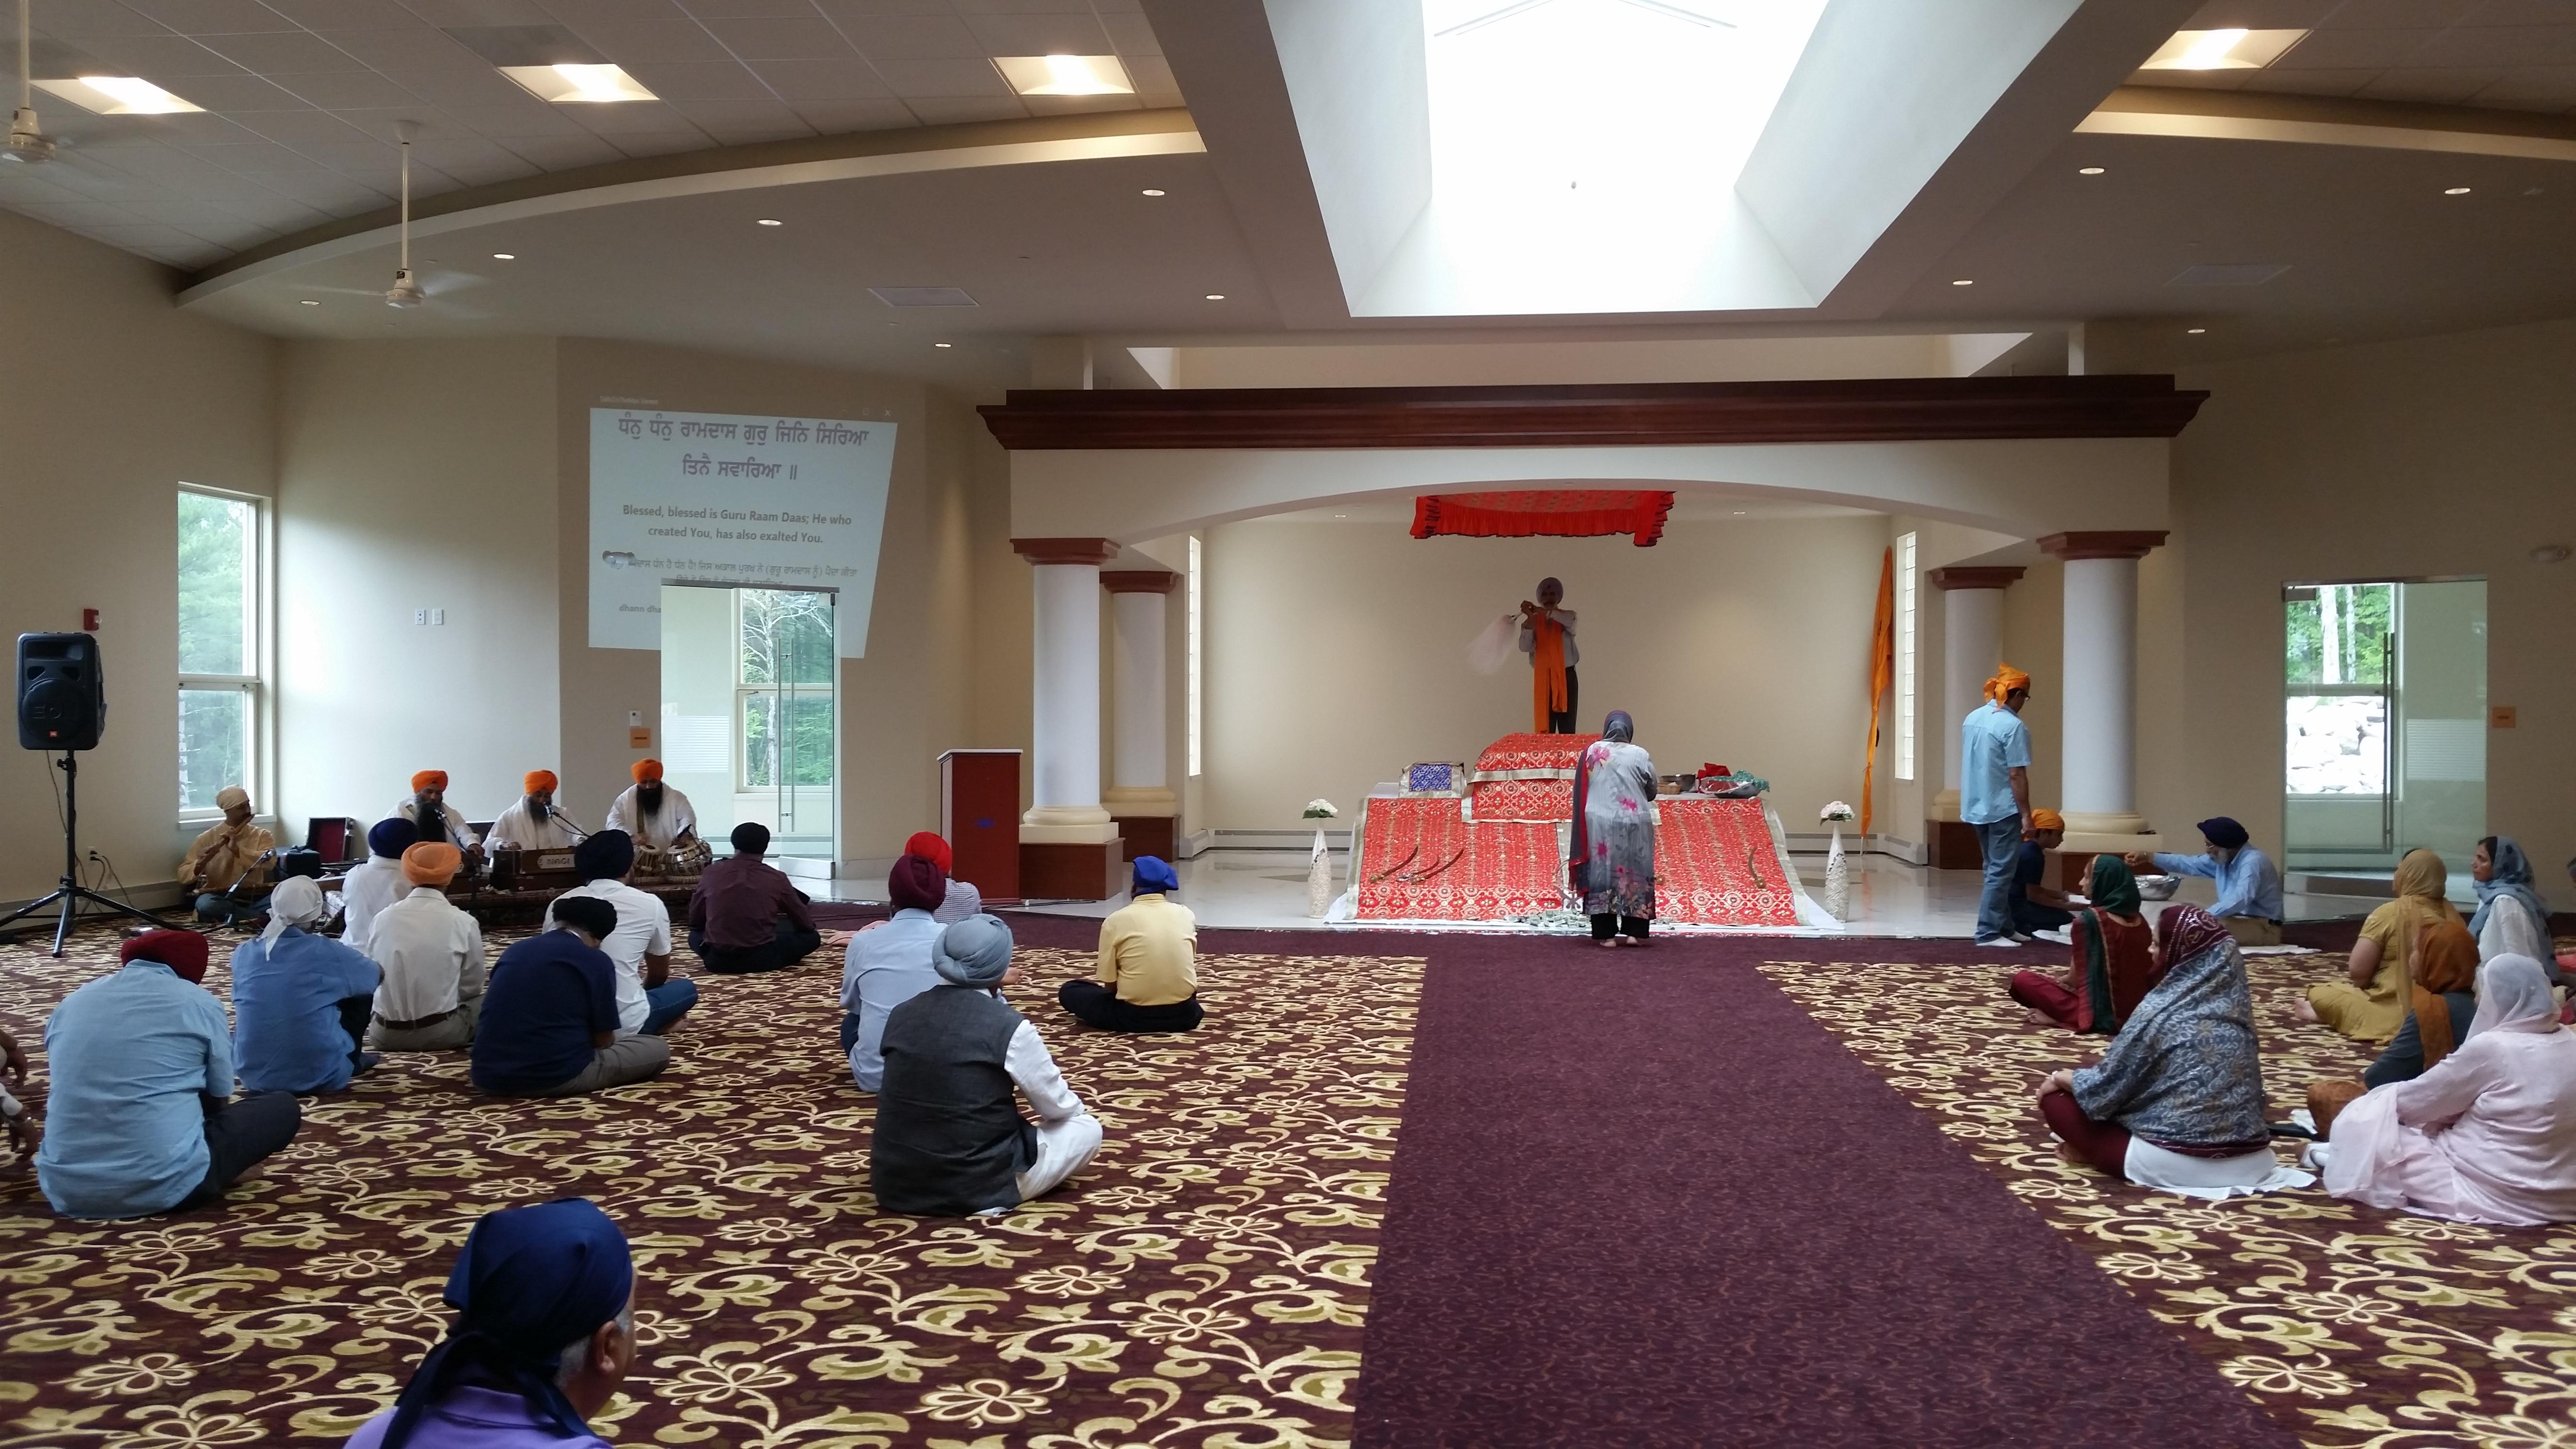 Gurdwara Sahib Sikh Study Circle - MapQuest